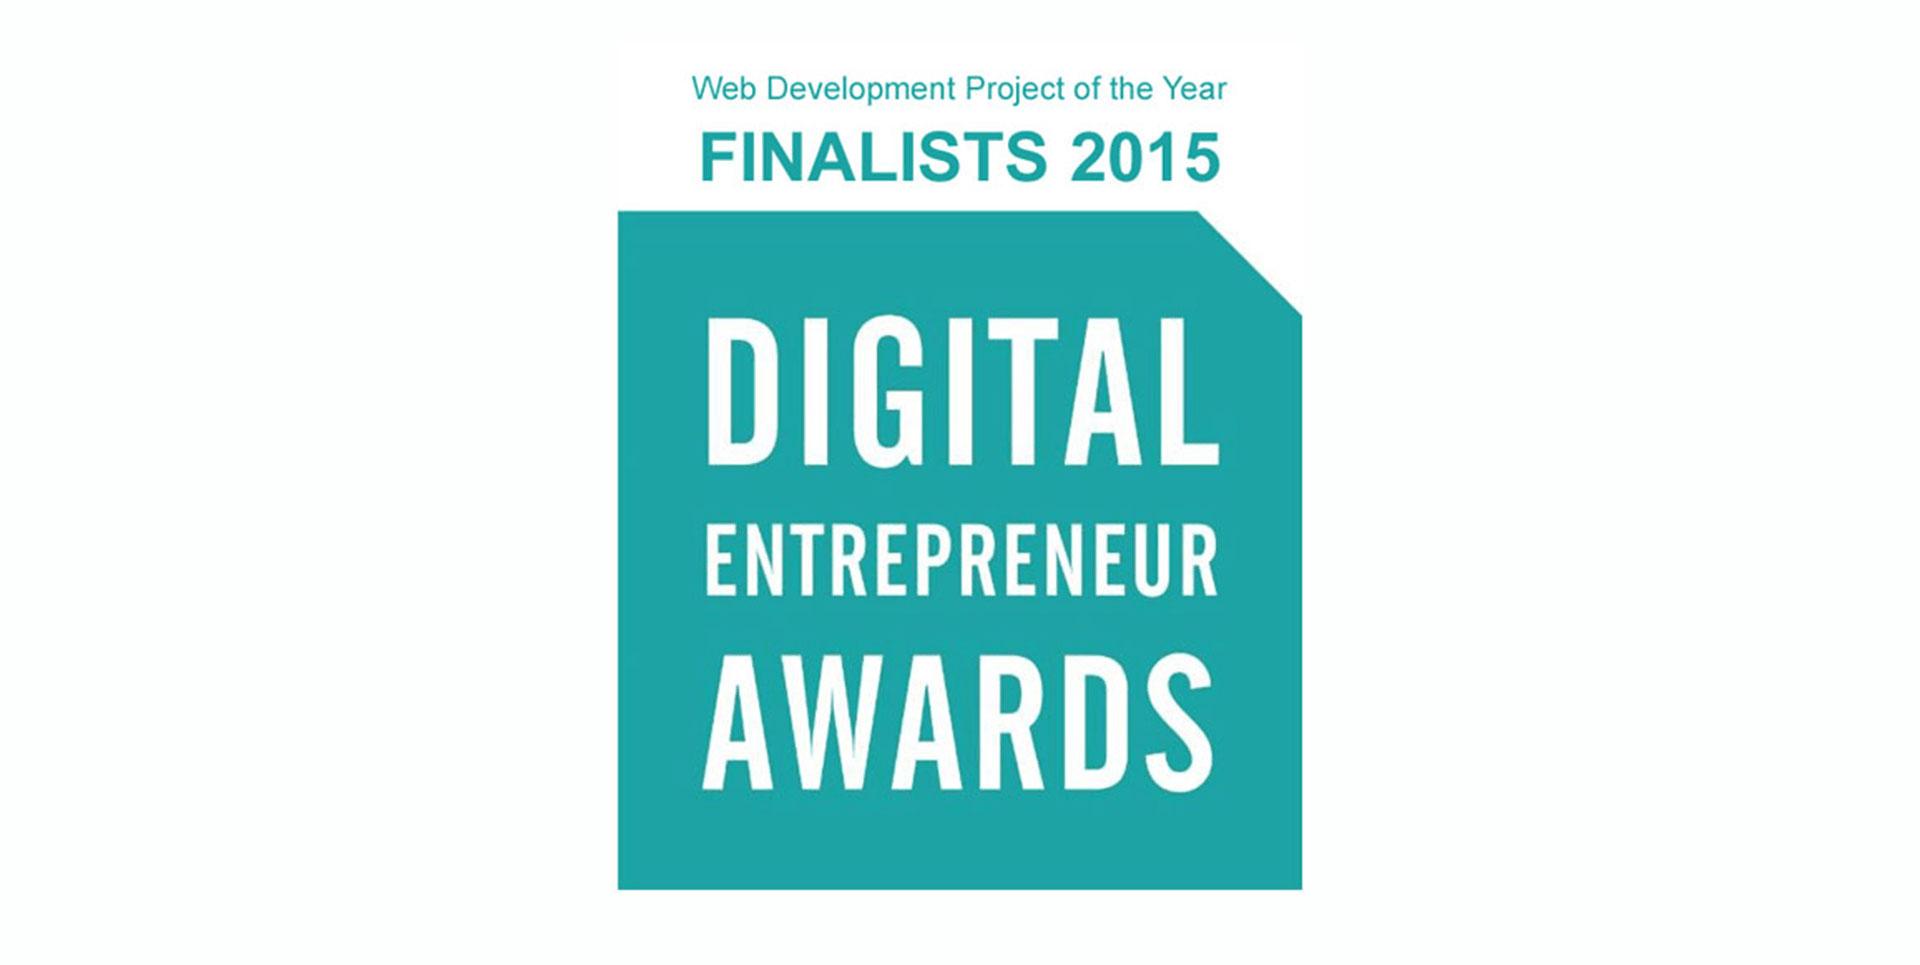 Digital Entrepreneur Award Finalists 2015